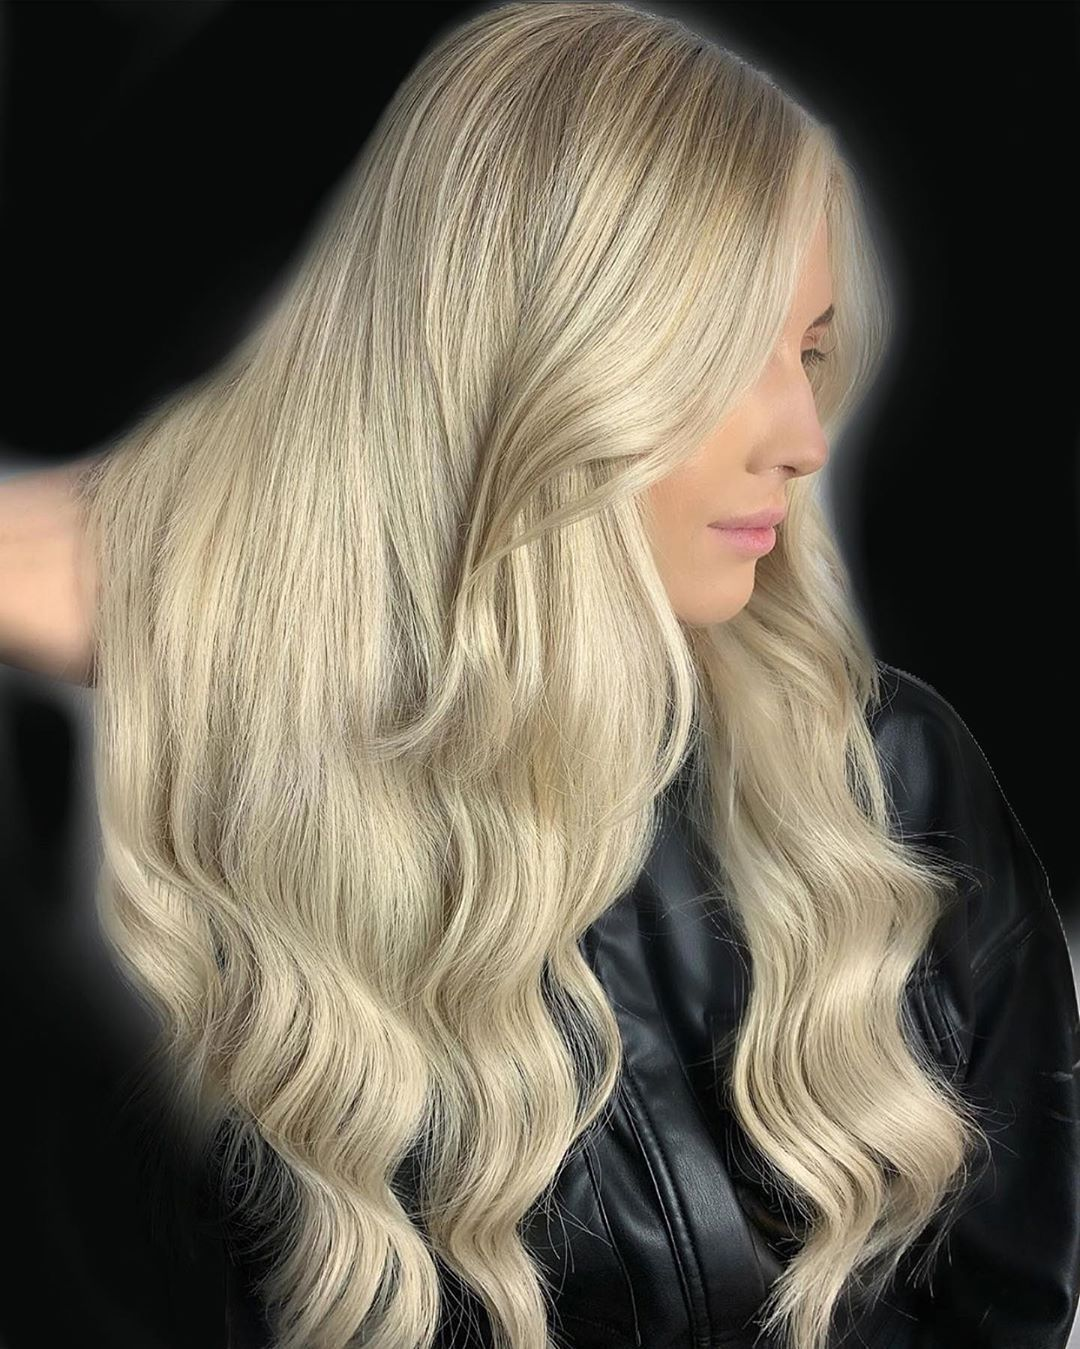 𝐵𝒶𝓇𝓁𝑒𝓎 𝐵𝓁𝑜𝓃𝒹𝑒..🖤 #awardwinningsalon #balayage #balayageartists #balayagehair #hairoftheday #hairinspo #hairinspiration #hairgoals #hairtrends #hairideas #instahair #hairofinsta #modernsalon #salonsdirect #behindthechair #hairpainting #hairfashion #hairporn #beautylaunchpad #dimentionalbalayage #livedinblonde #blonde #blondehair #hair #hairstyles #haircolour #chesterfield #clowne #WellaHair#luxelights